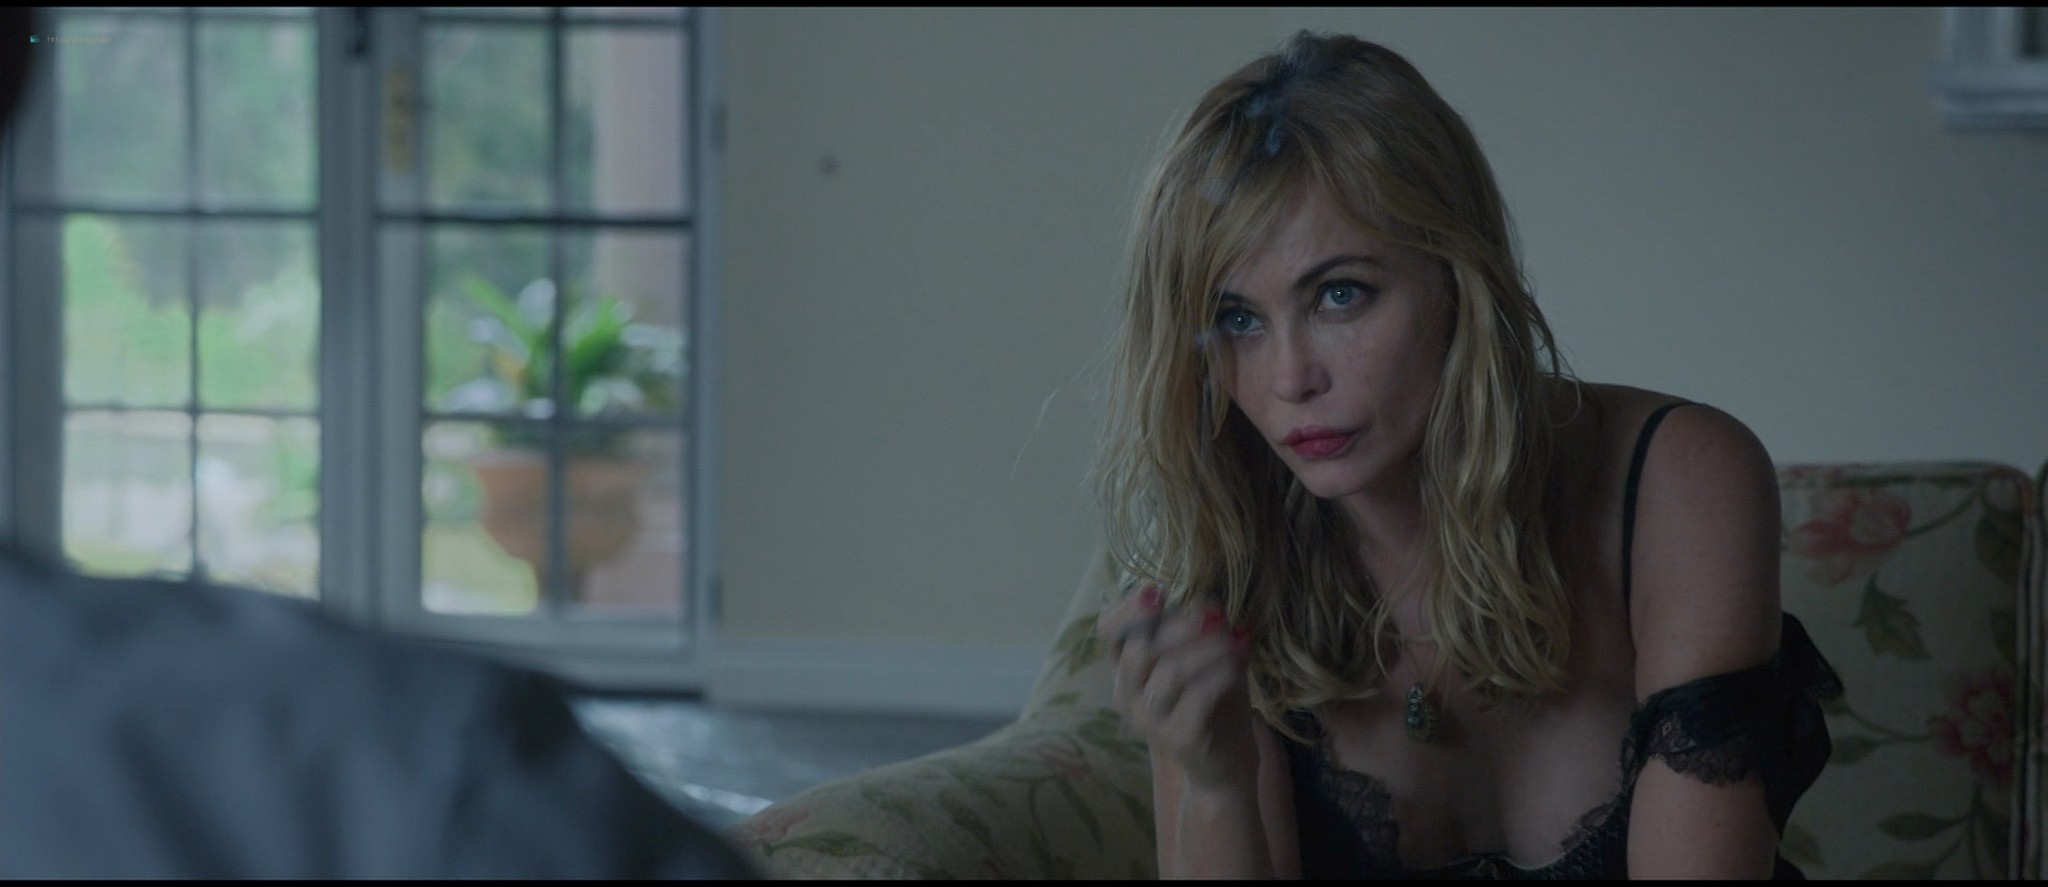 Emmanuelle Béart nude brief topless - My Mistress (AU-2014) HD 1080p BluRay (3)